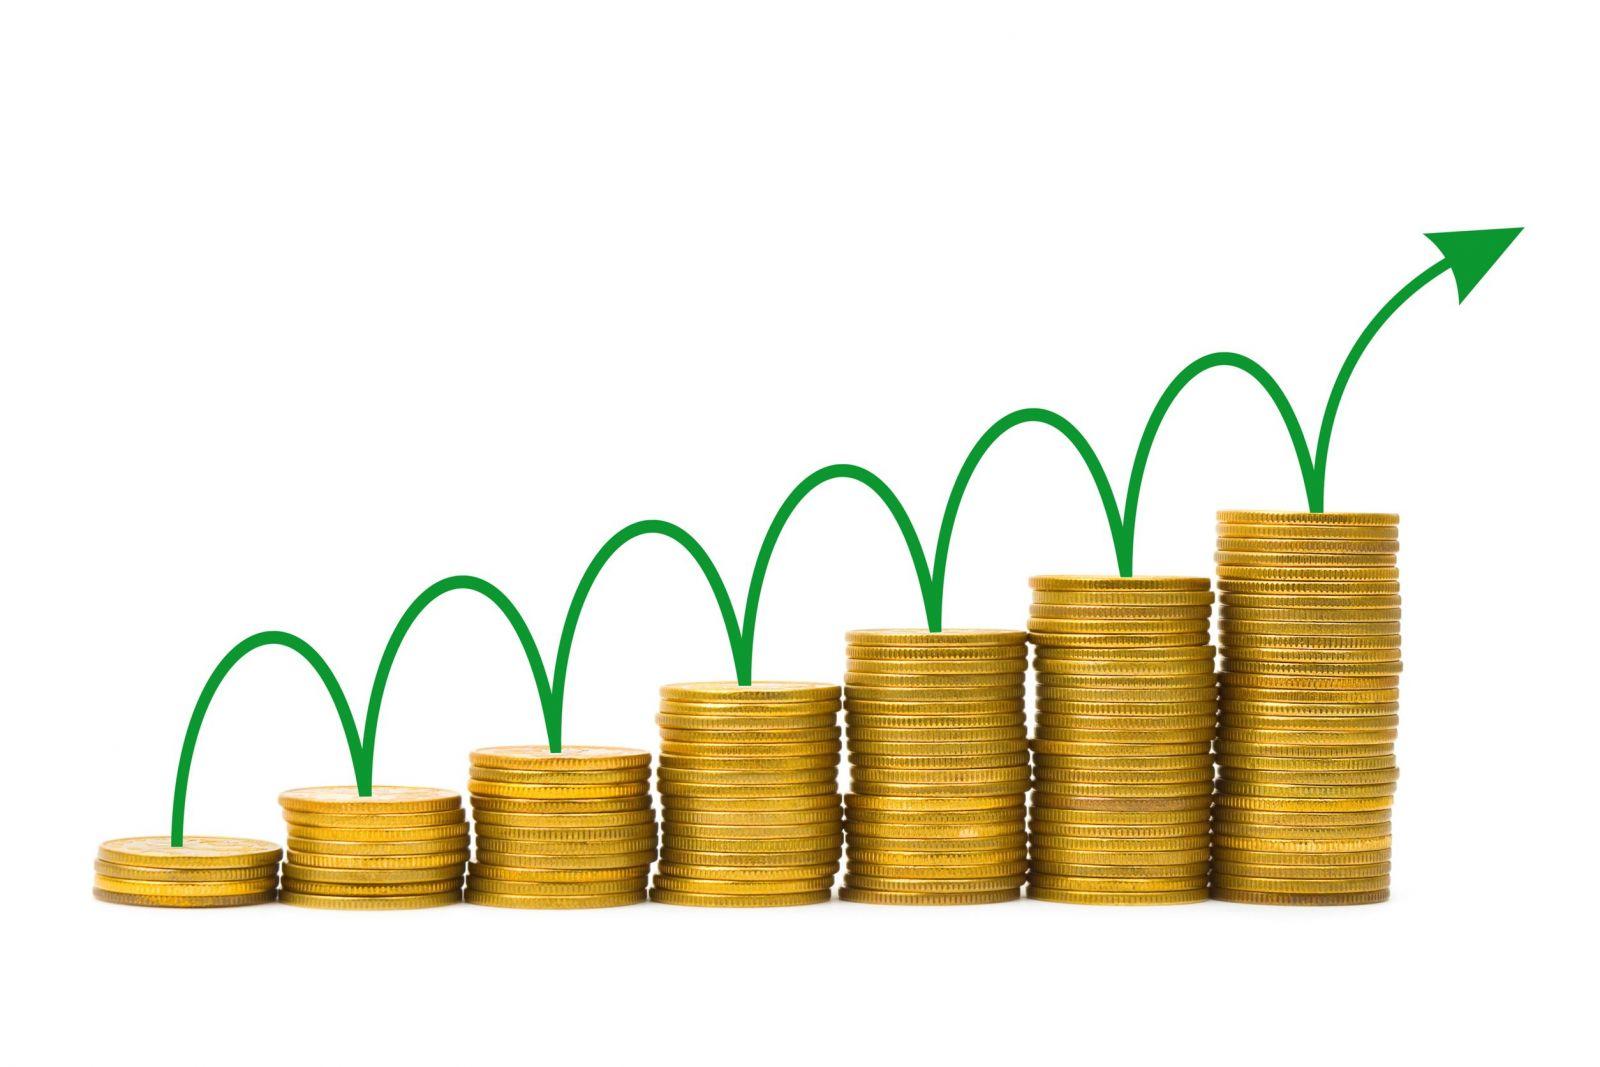 Optimize Your Supply Chain to Maximize Enterprise Value